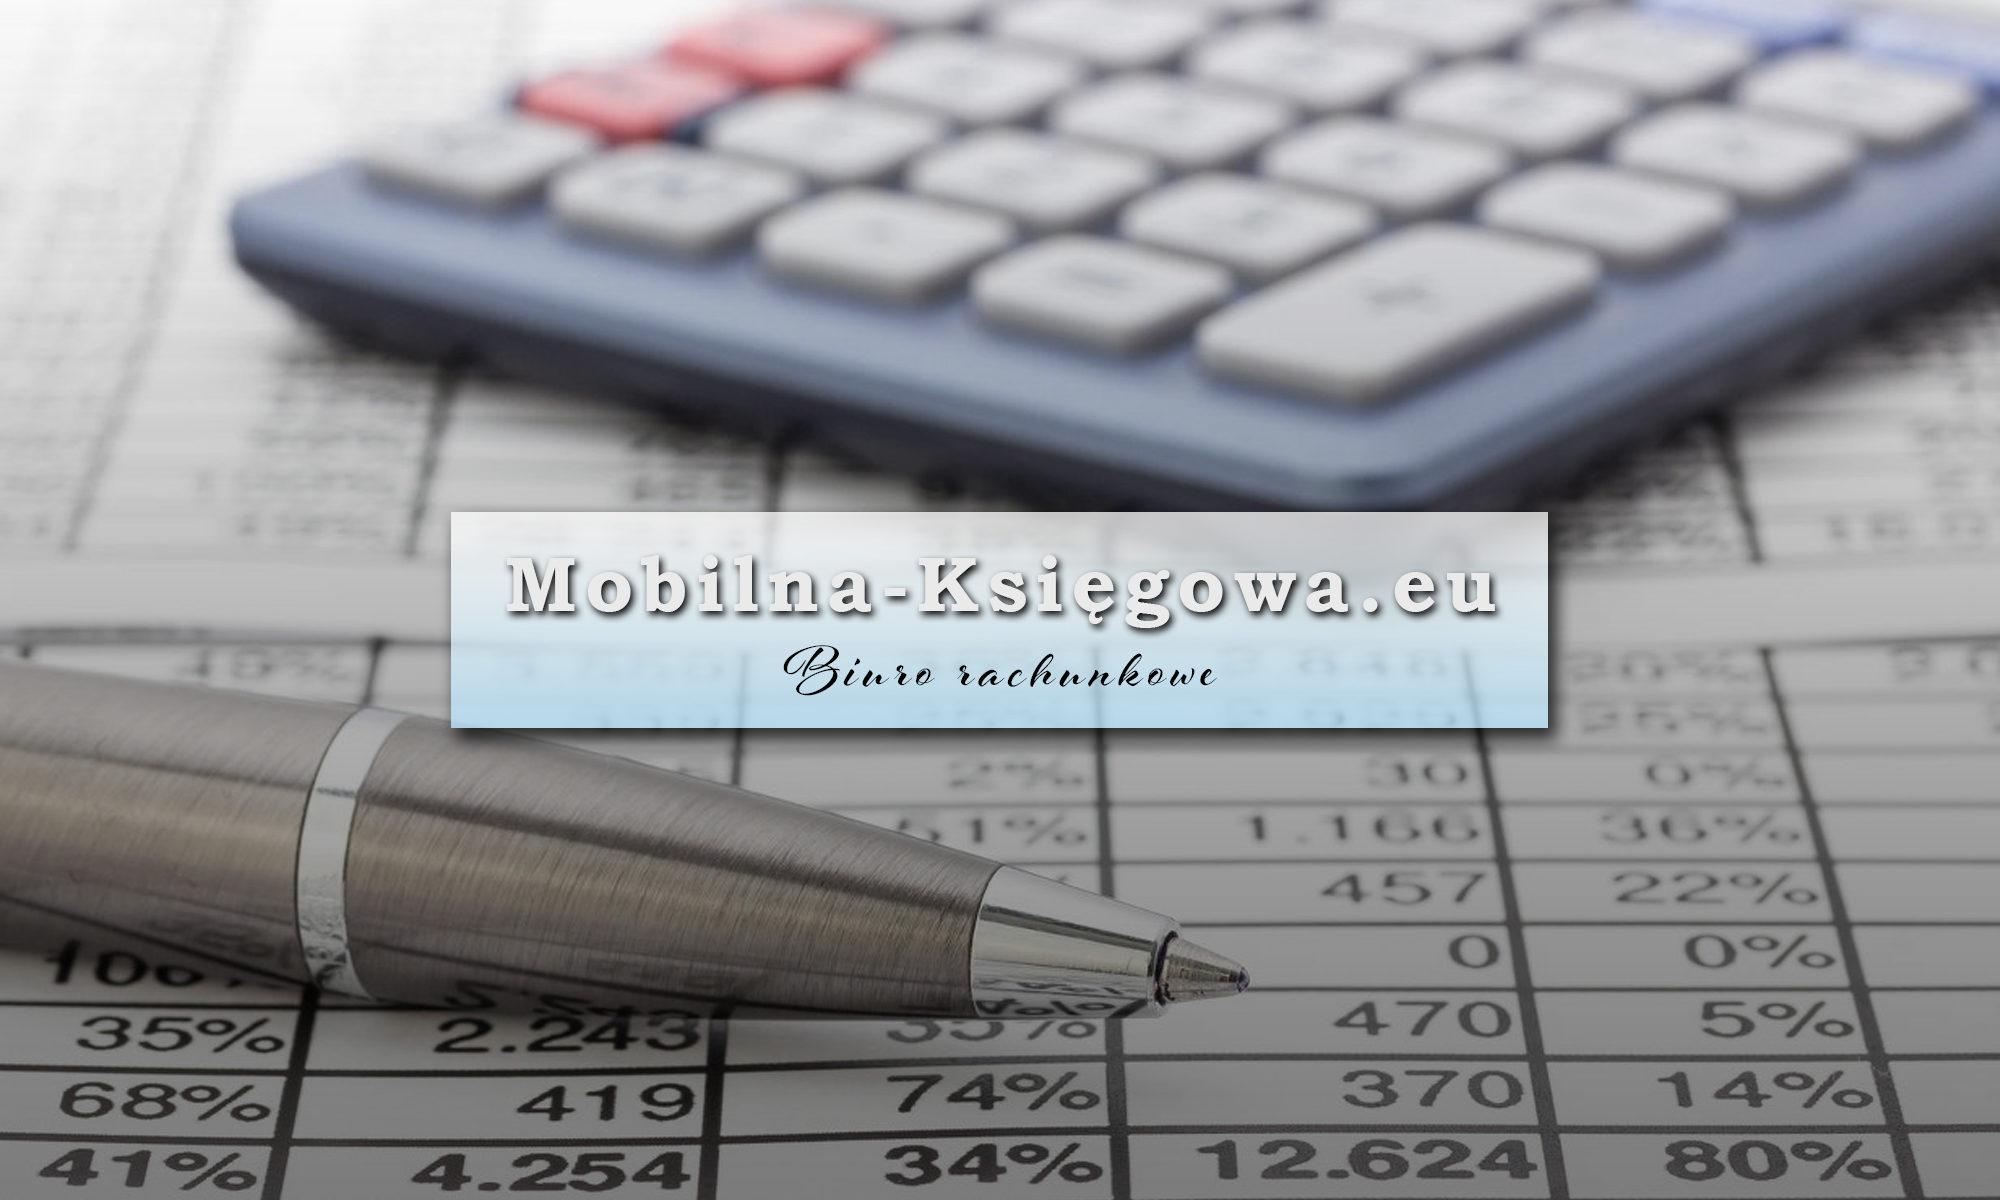 Mobilna-Księgowa.eu Biuro Rachunkowe Edyta Ciruk Księgowa